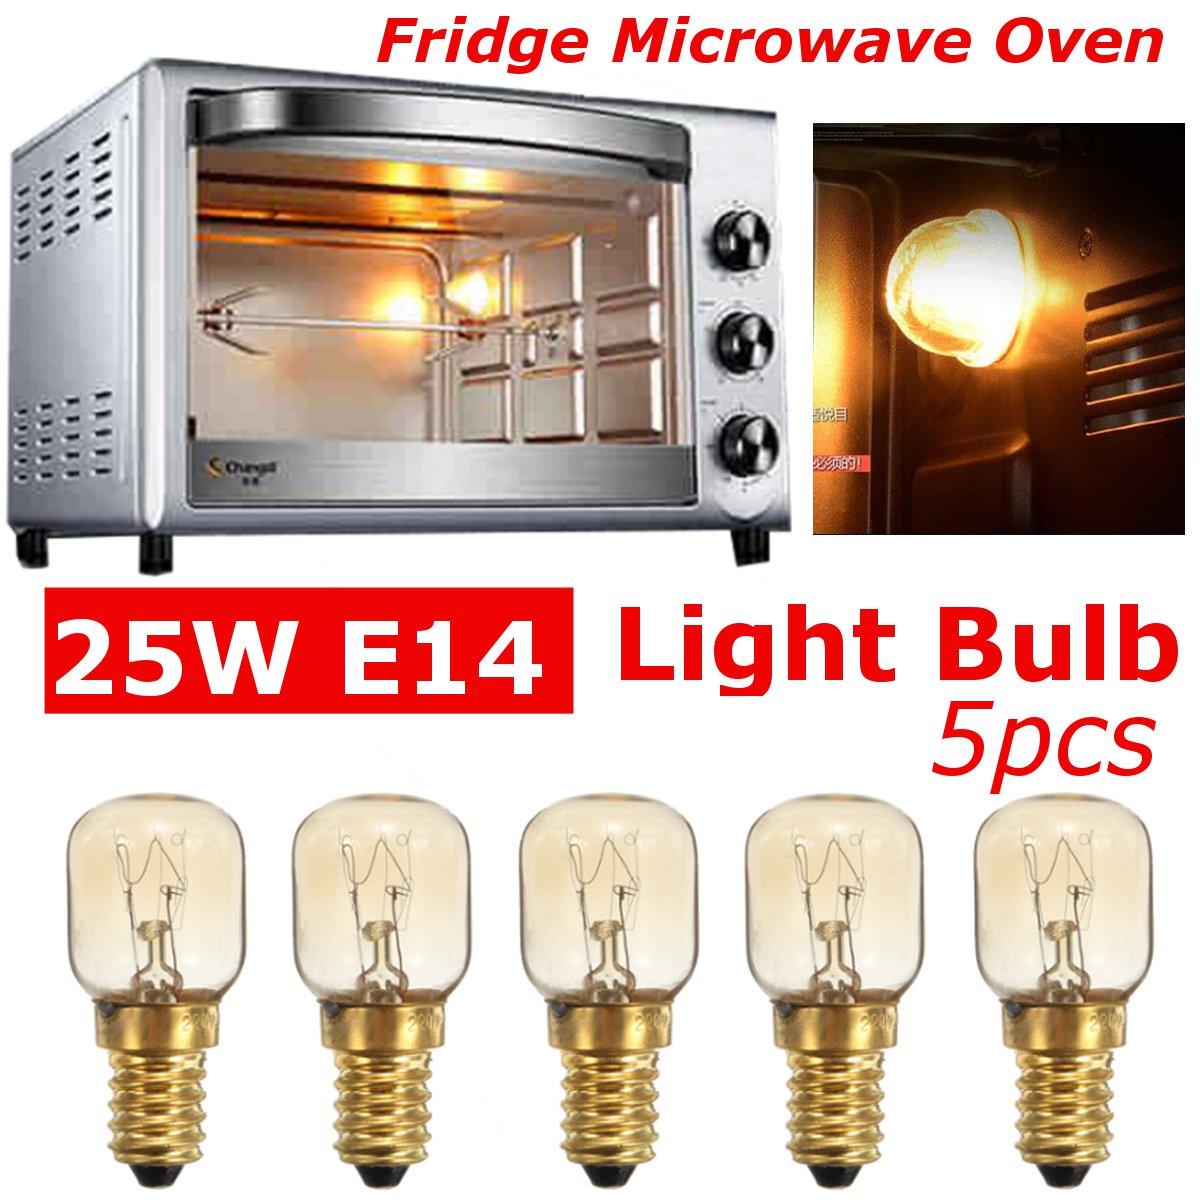 5Pcs Microwave Oven Light Lamp Bulb Base Design 250V 25W Replacement Universal E14 Screw in Light Bulbs High Temperature Lamps5Pcs Microwave Oven Light Lamp Bulb Base Design 250V 25W Replacement Universal E14 Screw in Light Bulbs High Temperature Lamps